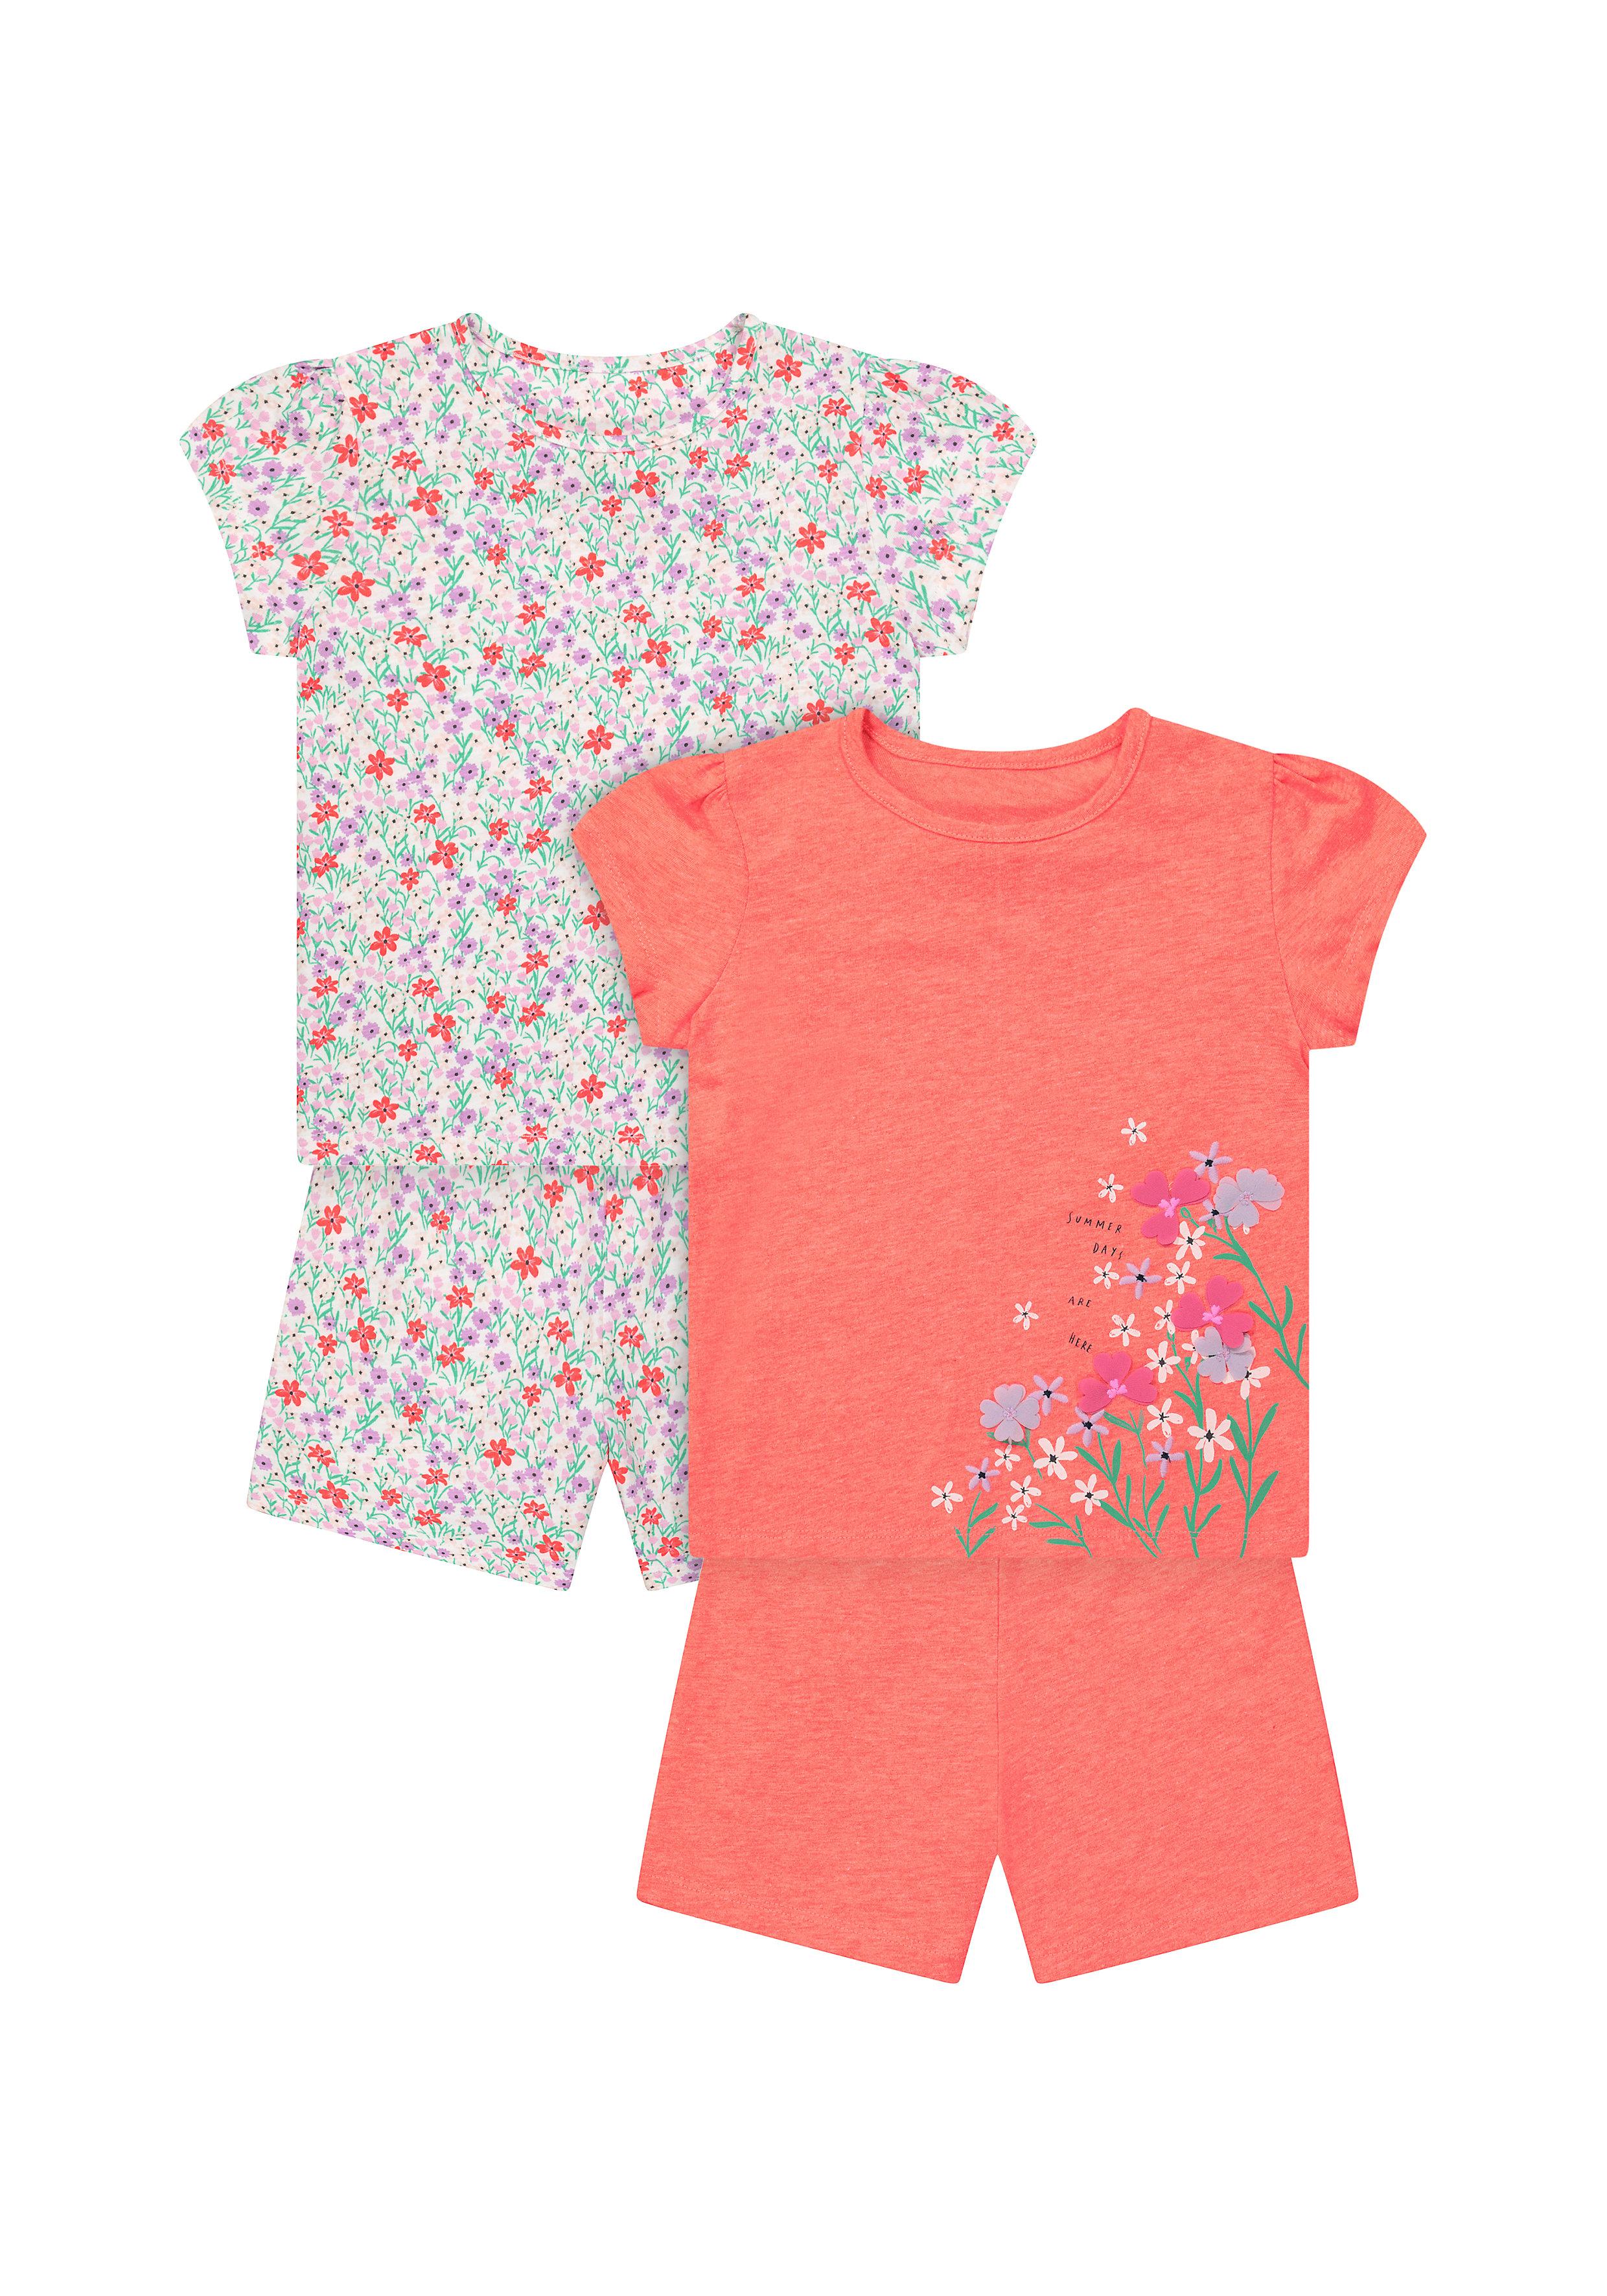 Mothercare | Girls Half Sleeves Shorts Sets - Pack Of 2 - Orange